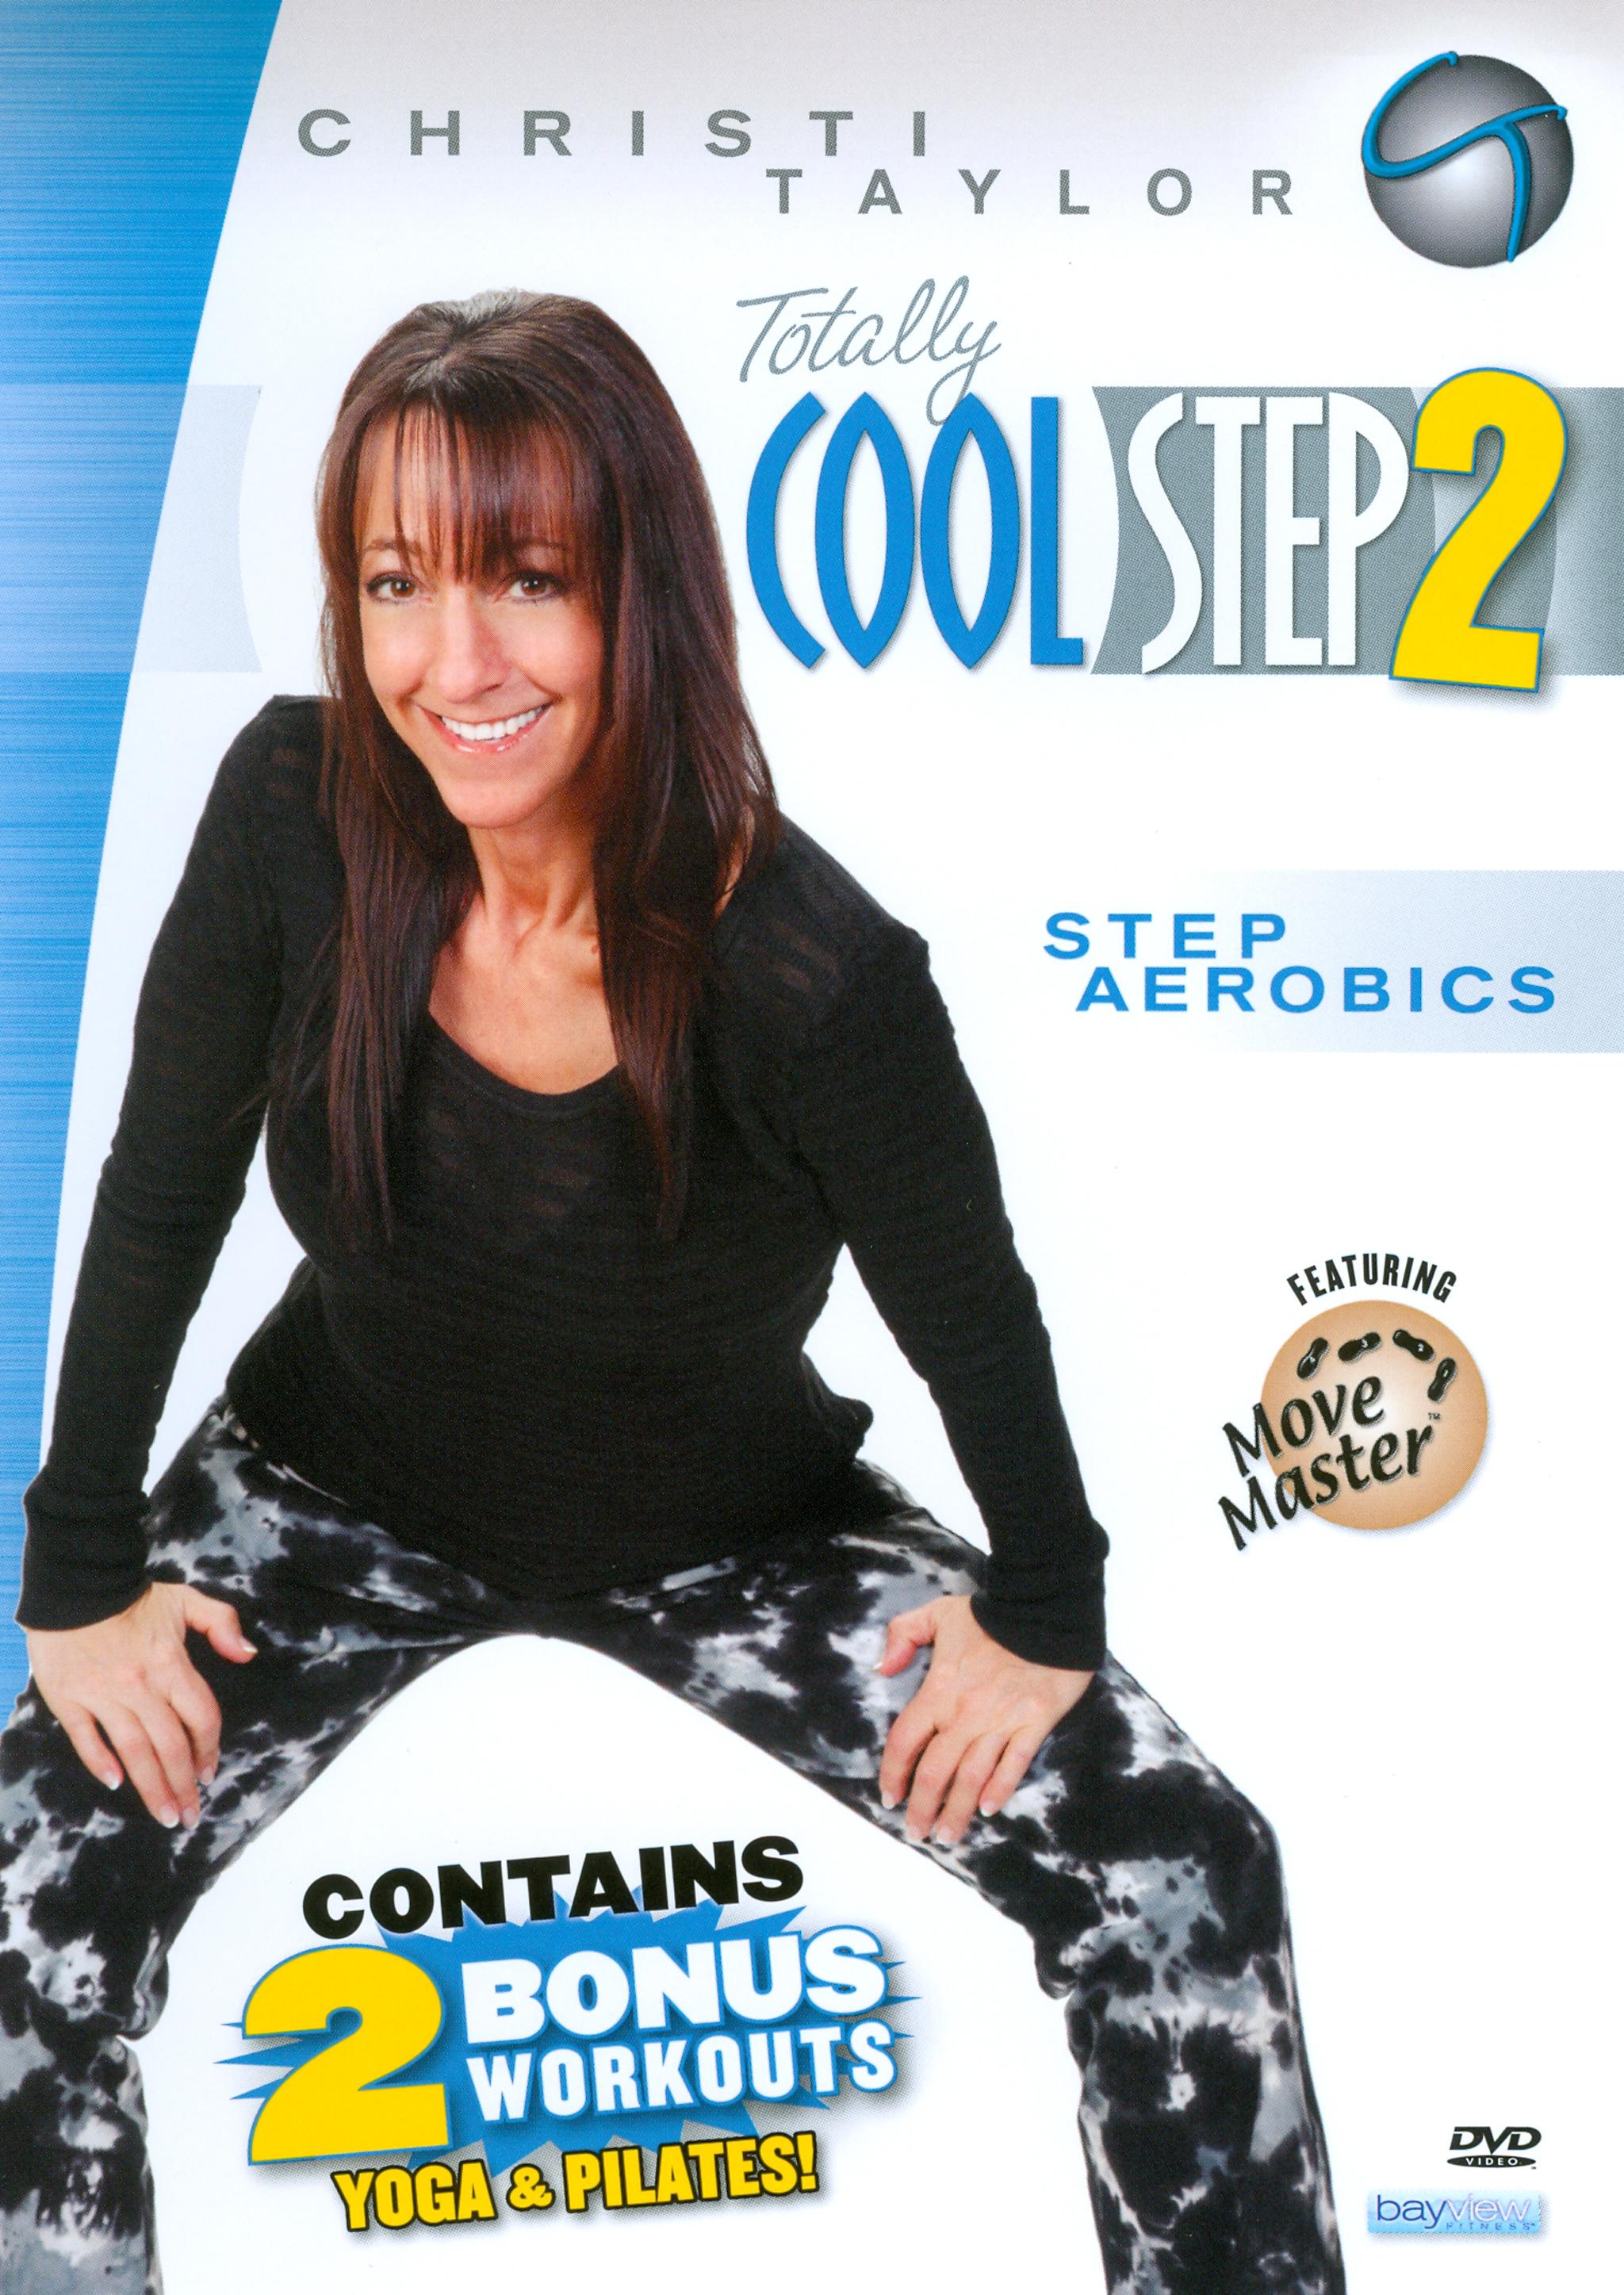 Christi Taylor: Totally Cool Step 2